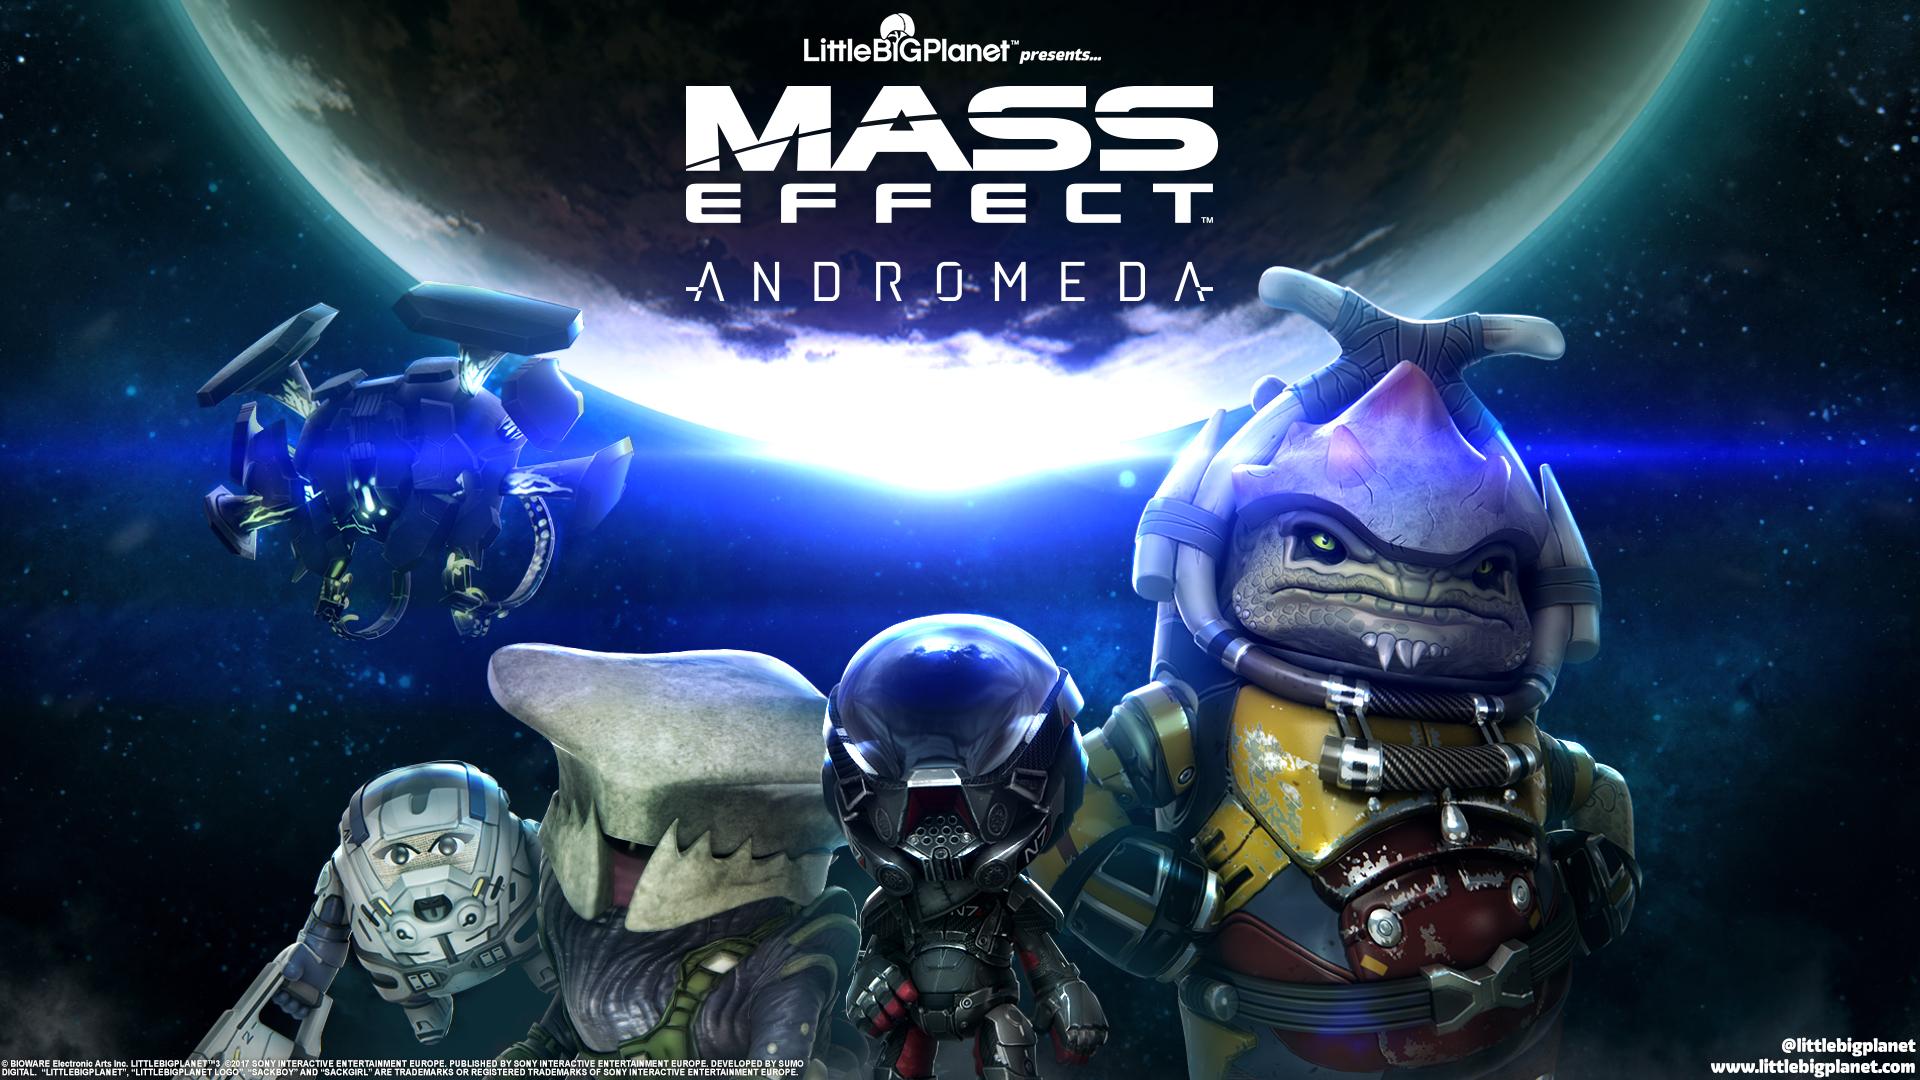 Mass Effect Andromeda Little Big Planet 3, HD Games, 4k